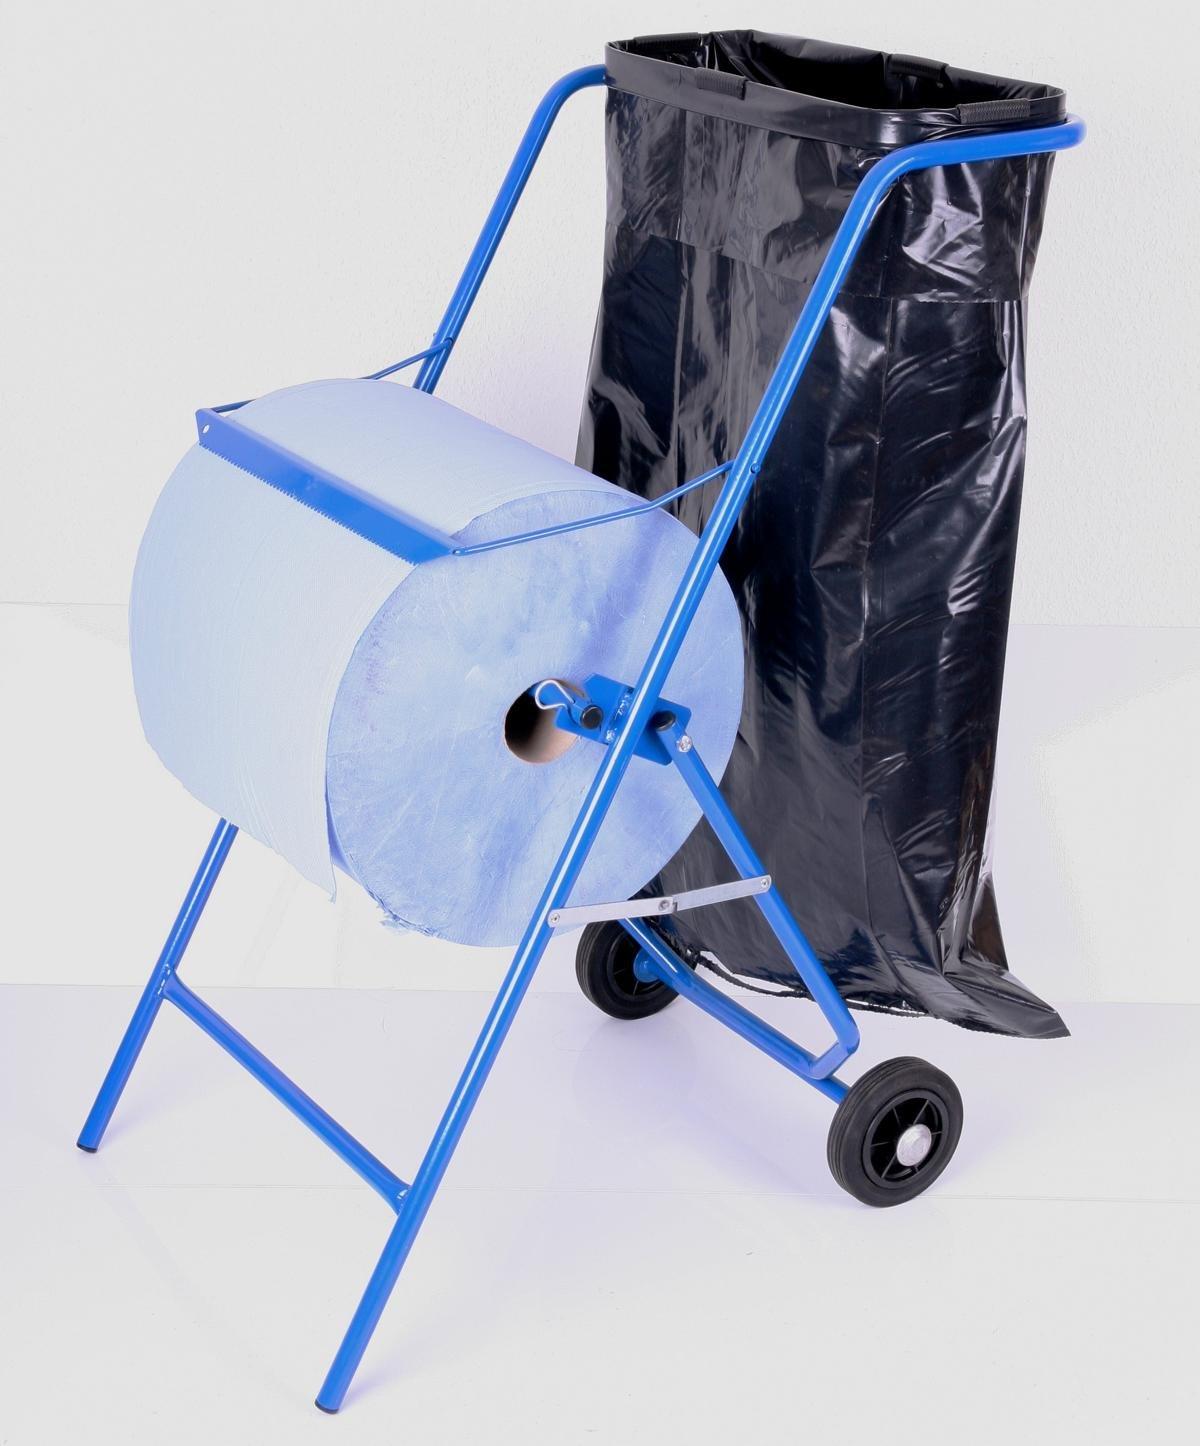 Papierrollenhalter Bodenständer inkl. Müllsackhalter, 100 x 50 x 70 ...